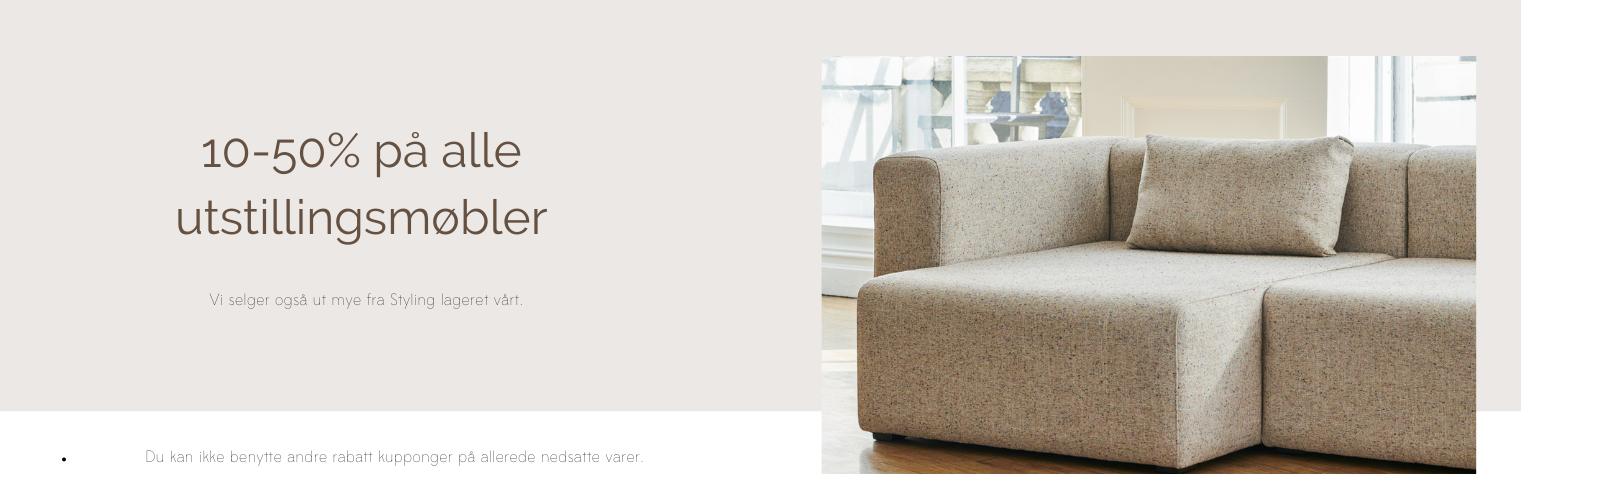 Møbel Salg Design  Kampanje